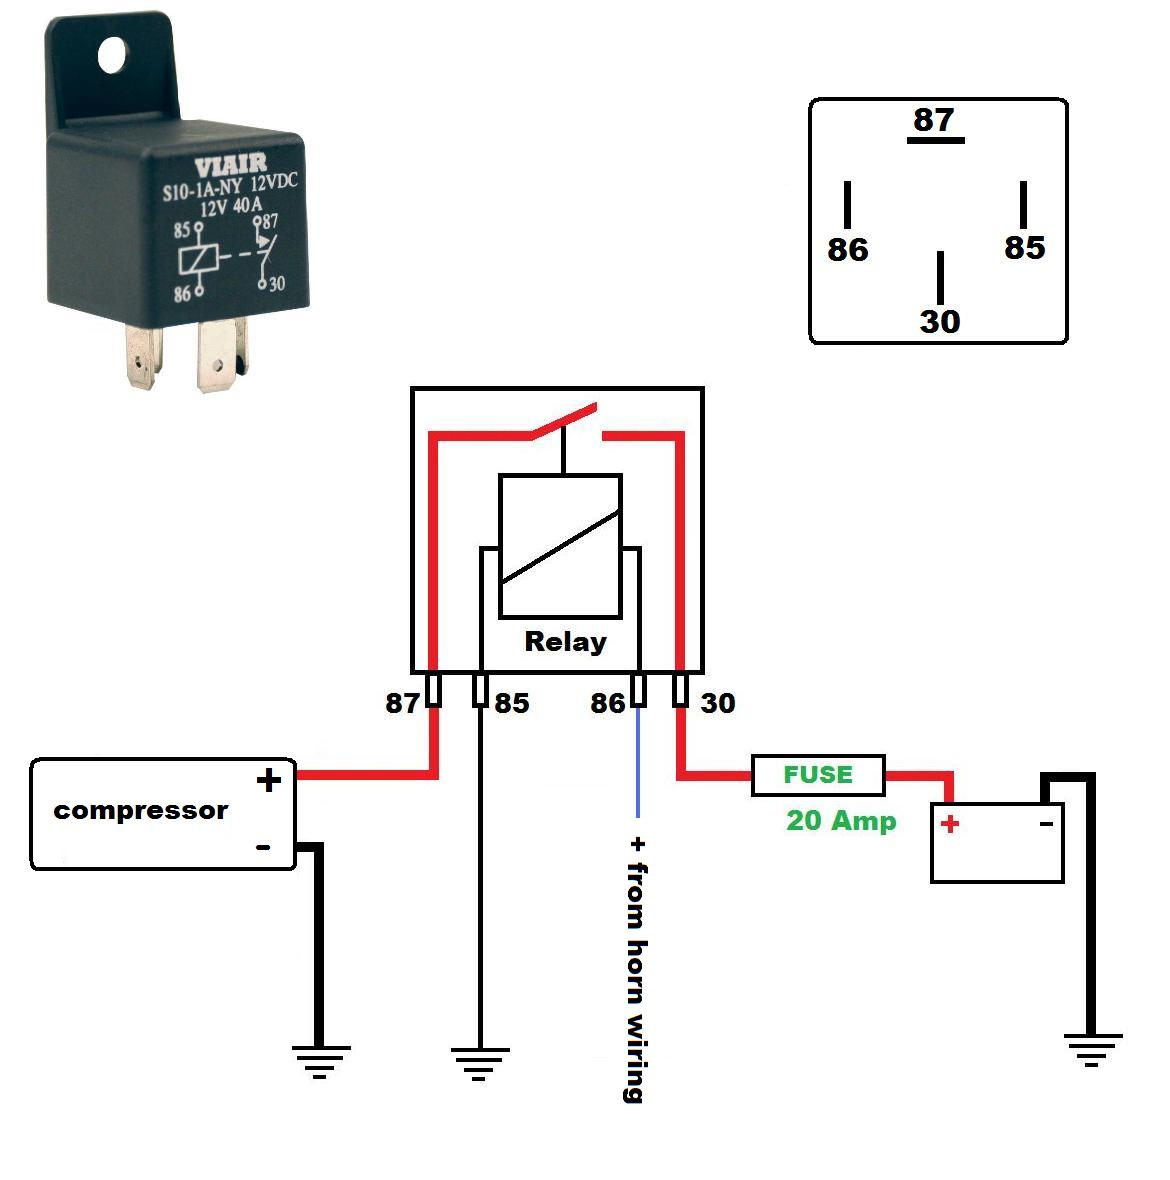 Relay Wiring Diagram For Air Horns - Toyota 3vze Injector Wire Diagram -  peugeotjetforce.yenpancane.jeanjaures37.fr | Volvo Truck Air Horn Wiring Diagram |  | Wiring Diagram Resource